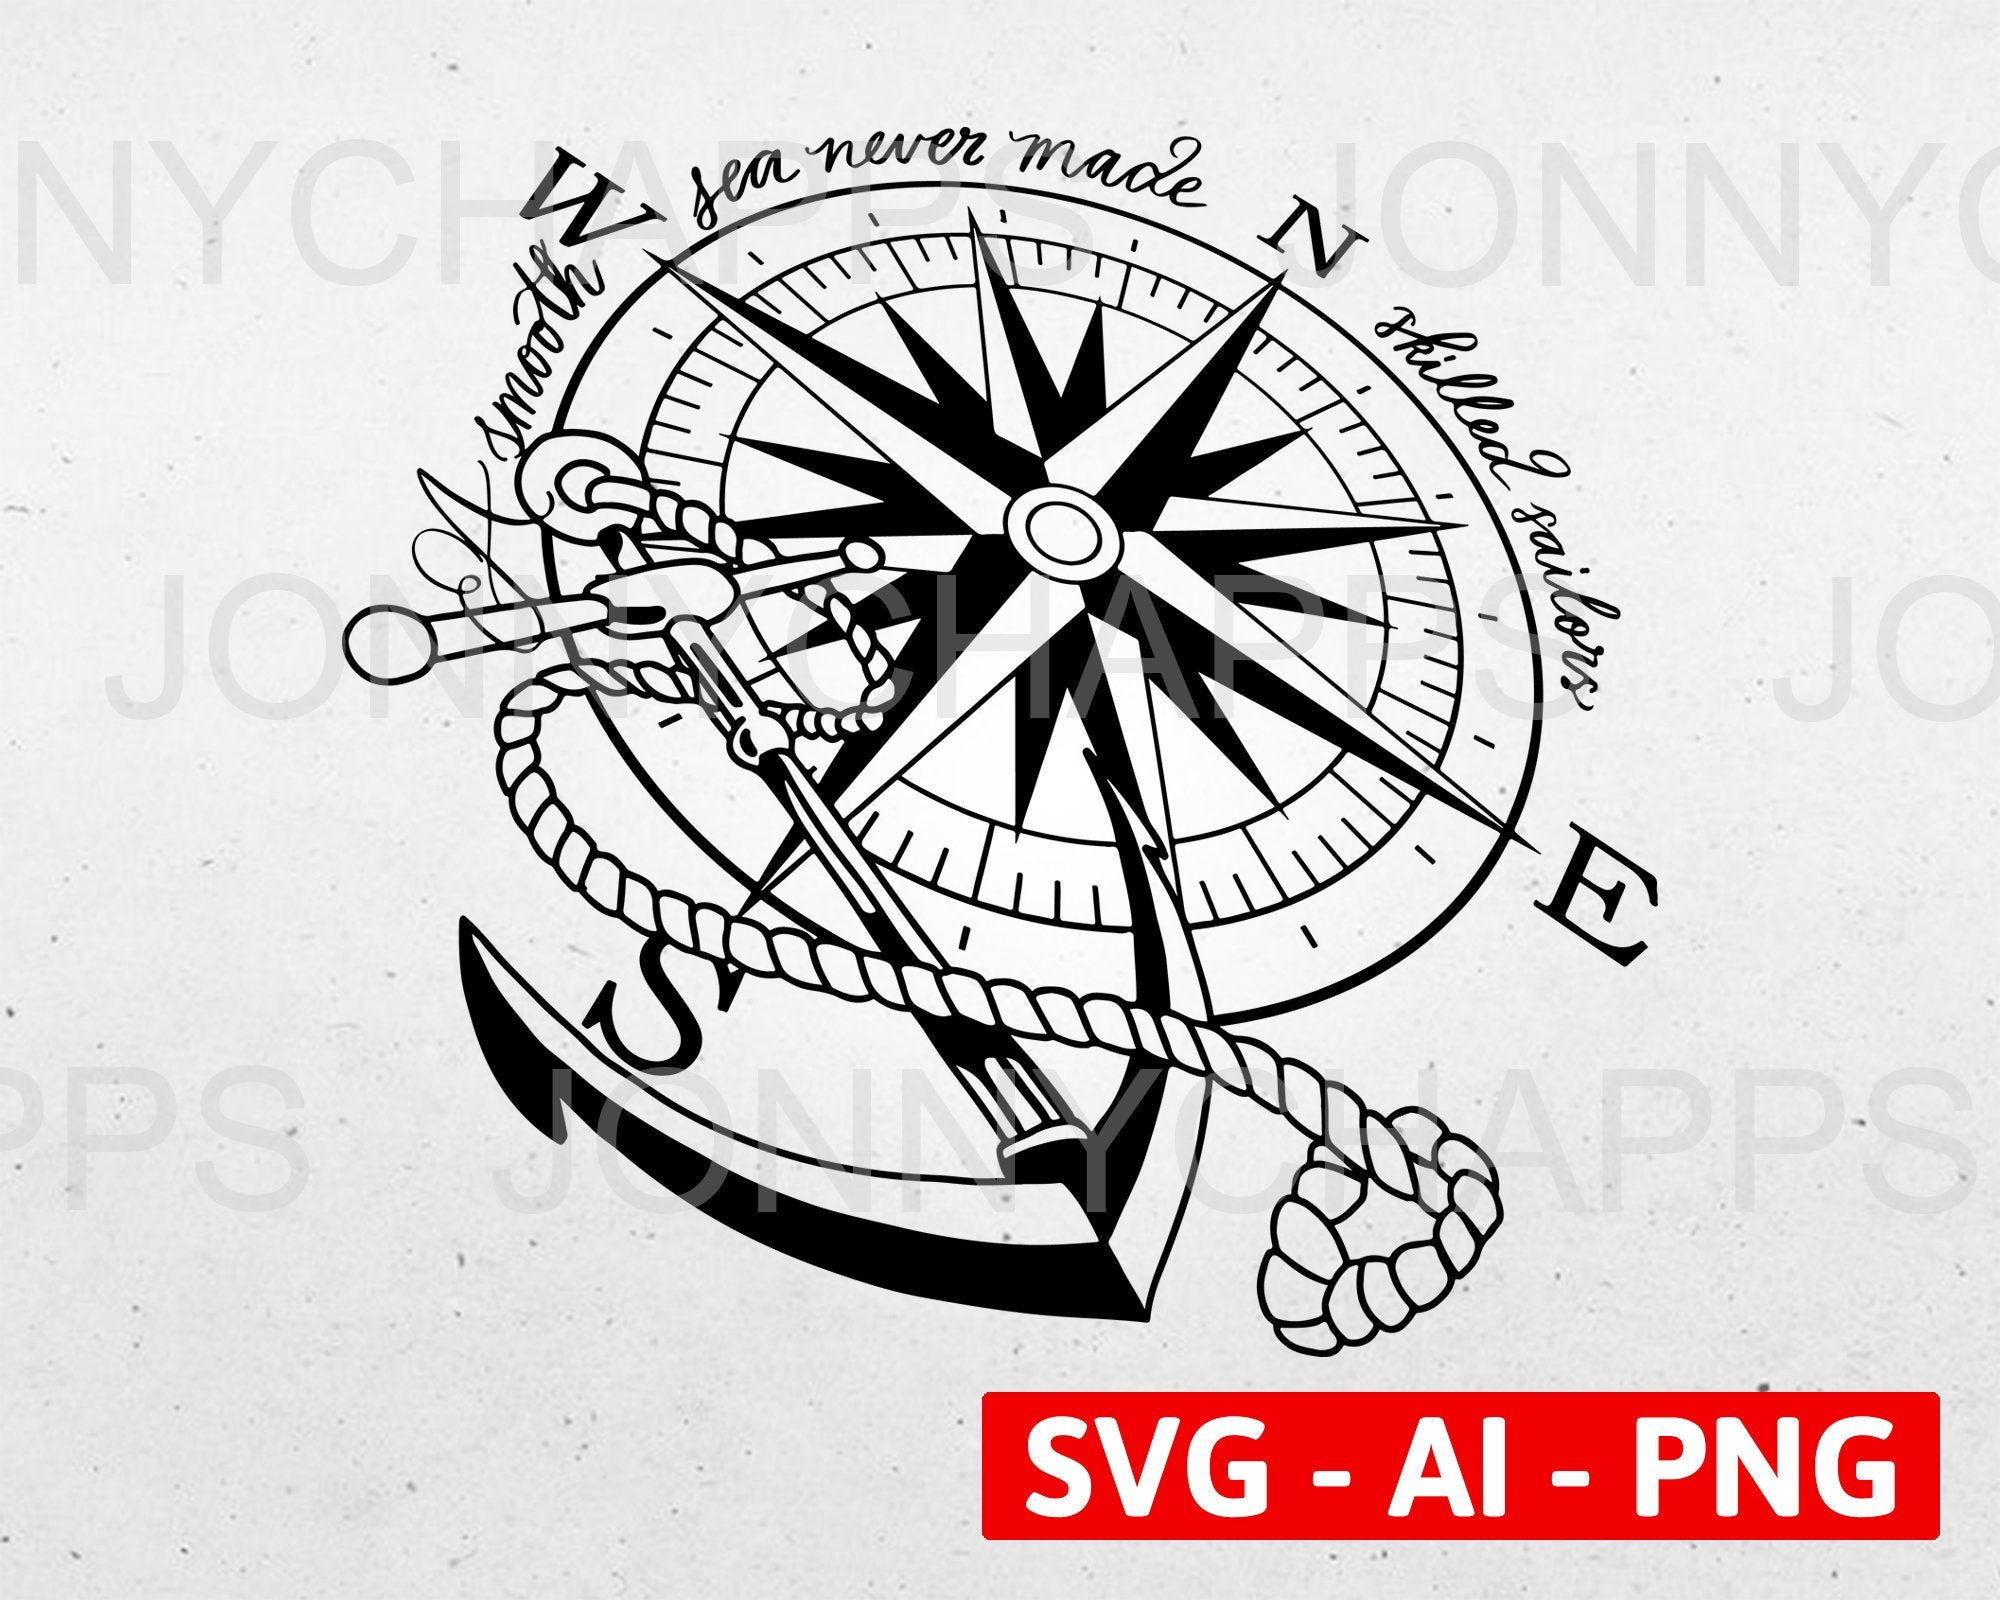 Valentine SVG Compass SVG Love SVG Nautical Svg Printable Cut File for Silhouette Cricut Design Space